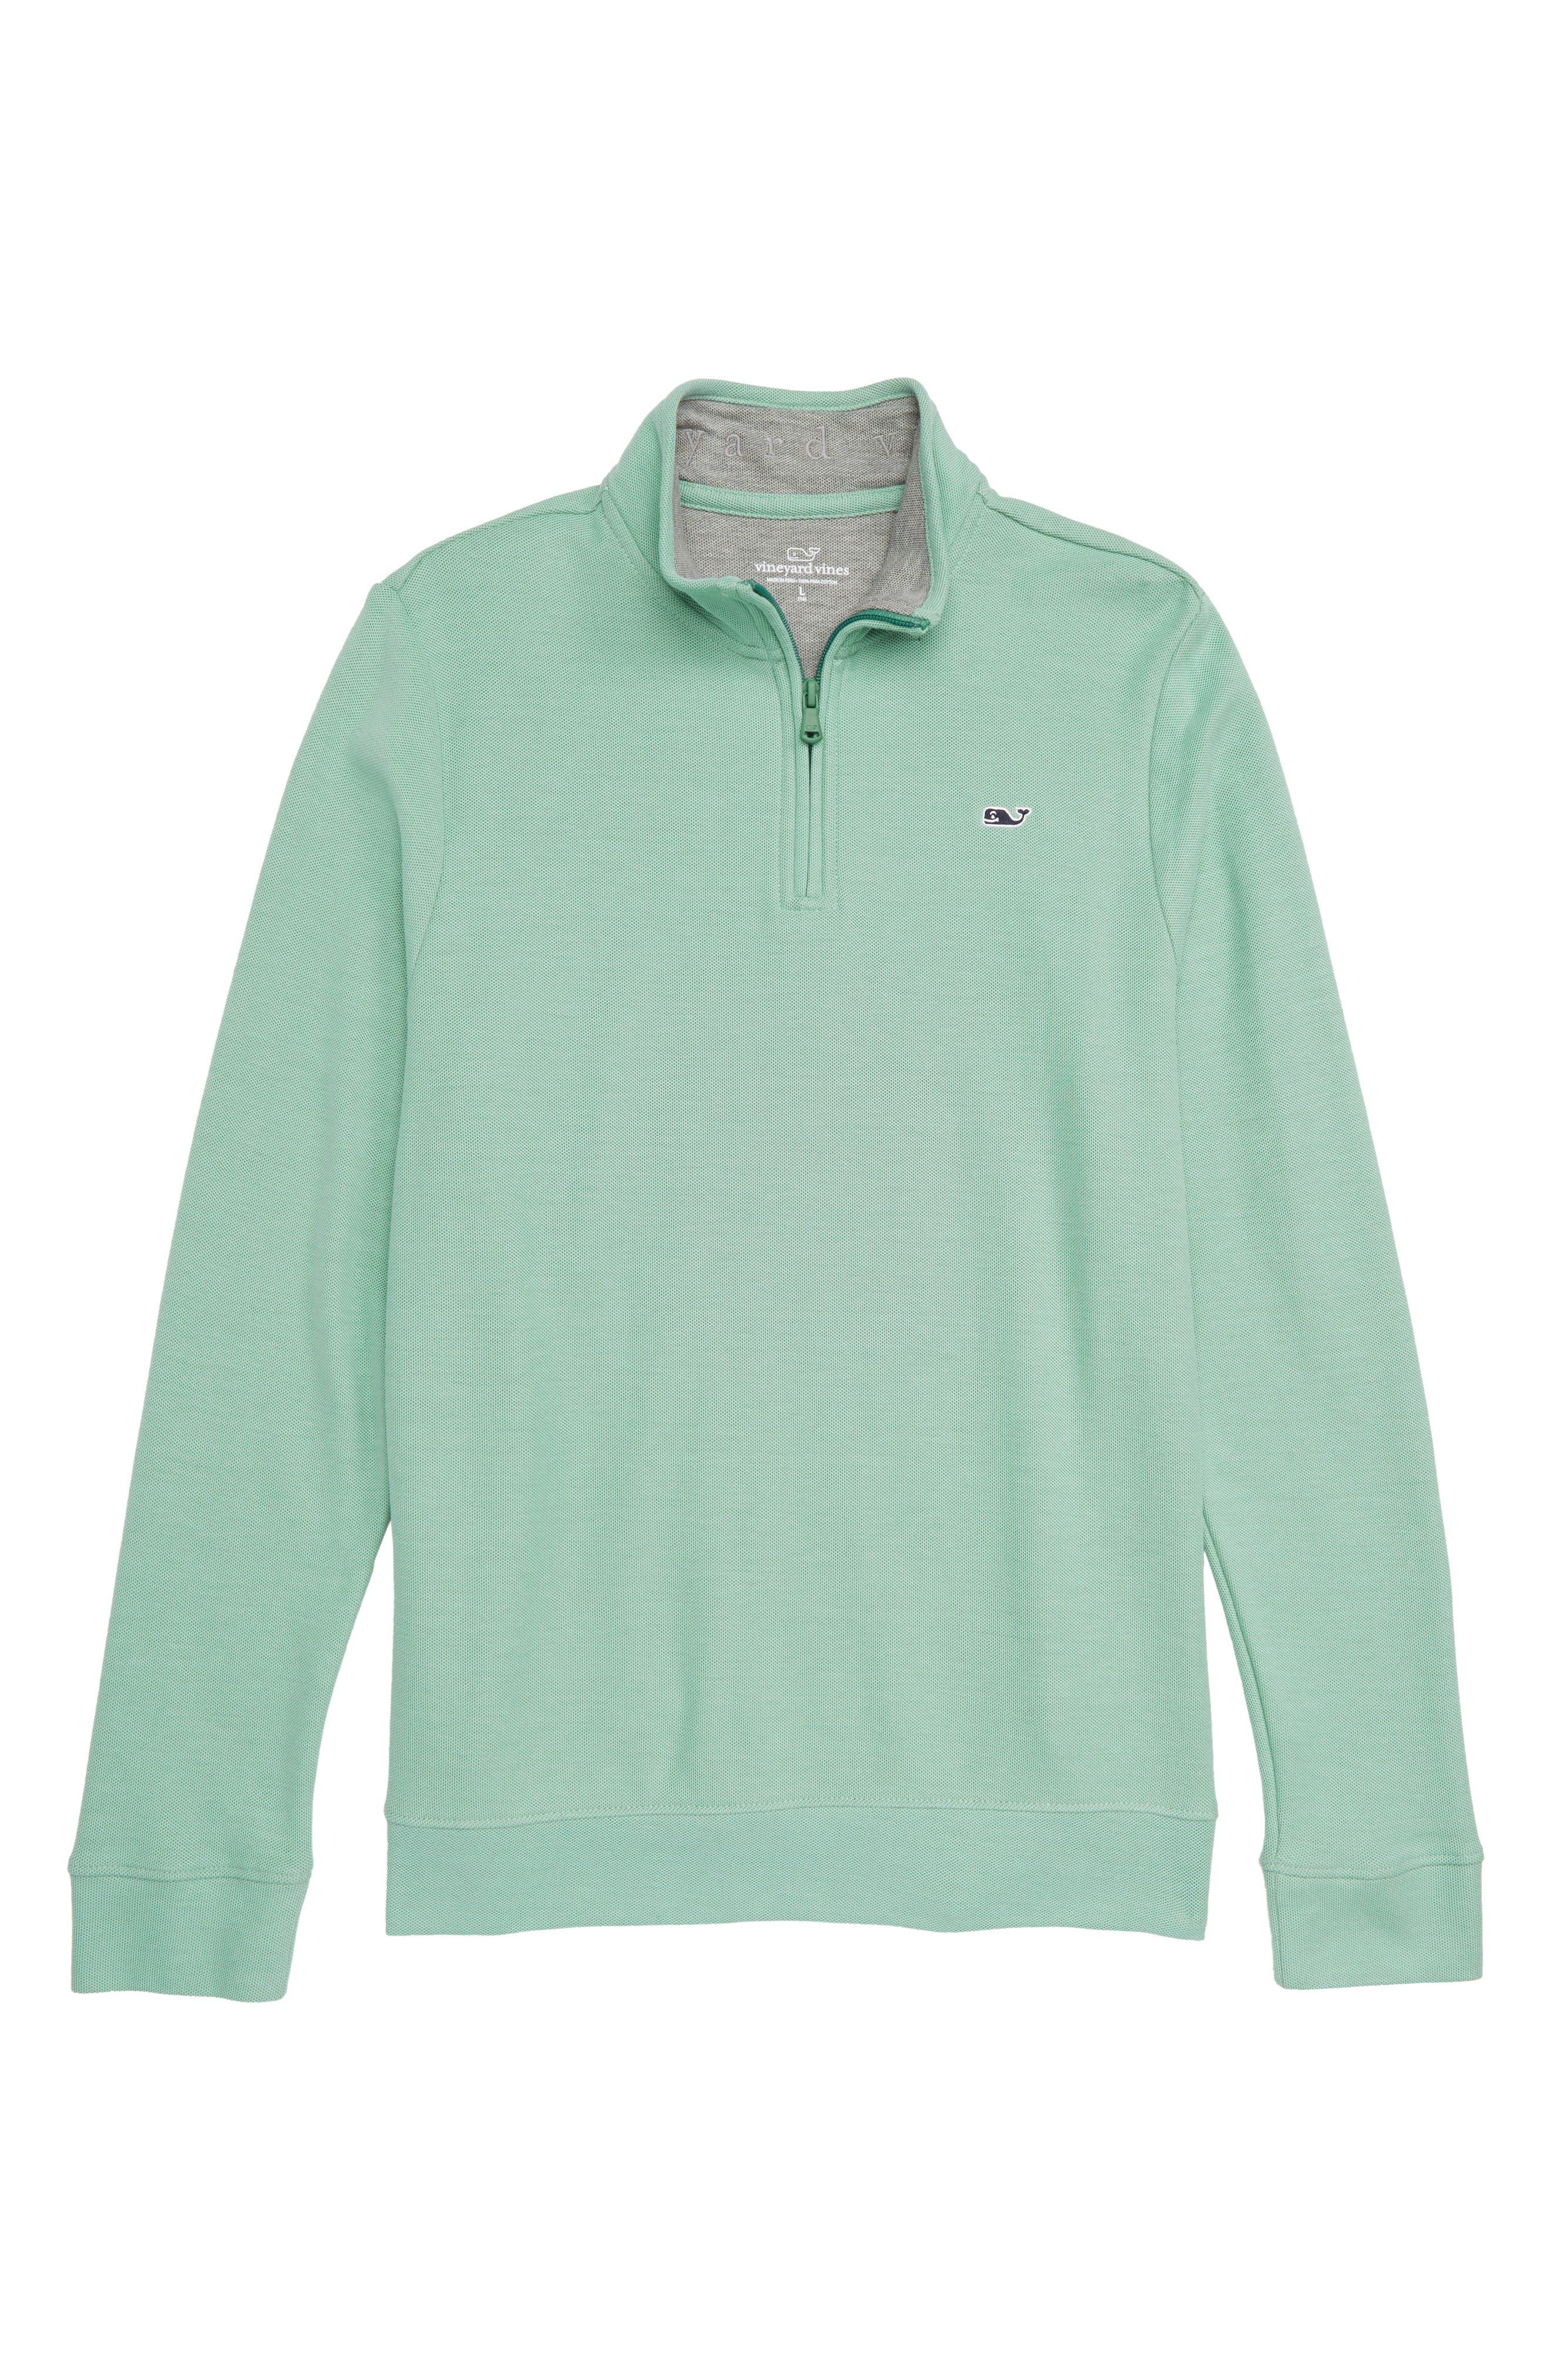 Quarter Zip Pullover,                         Main,                         color, Starboard Green